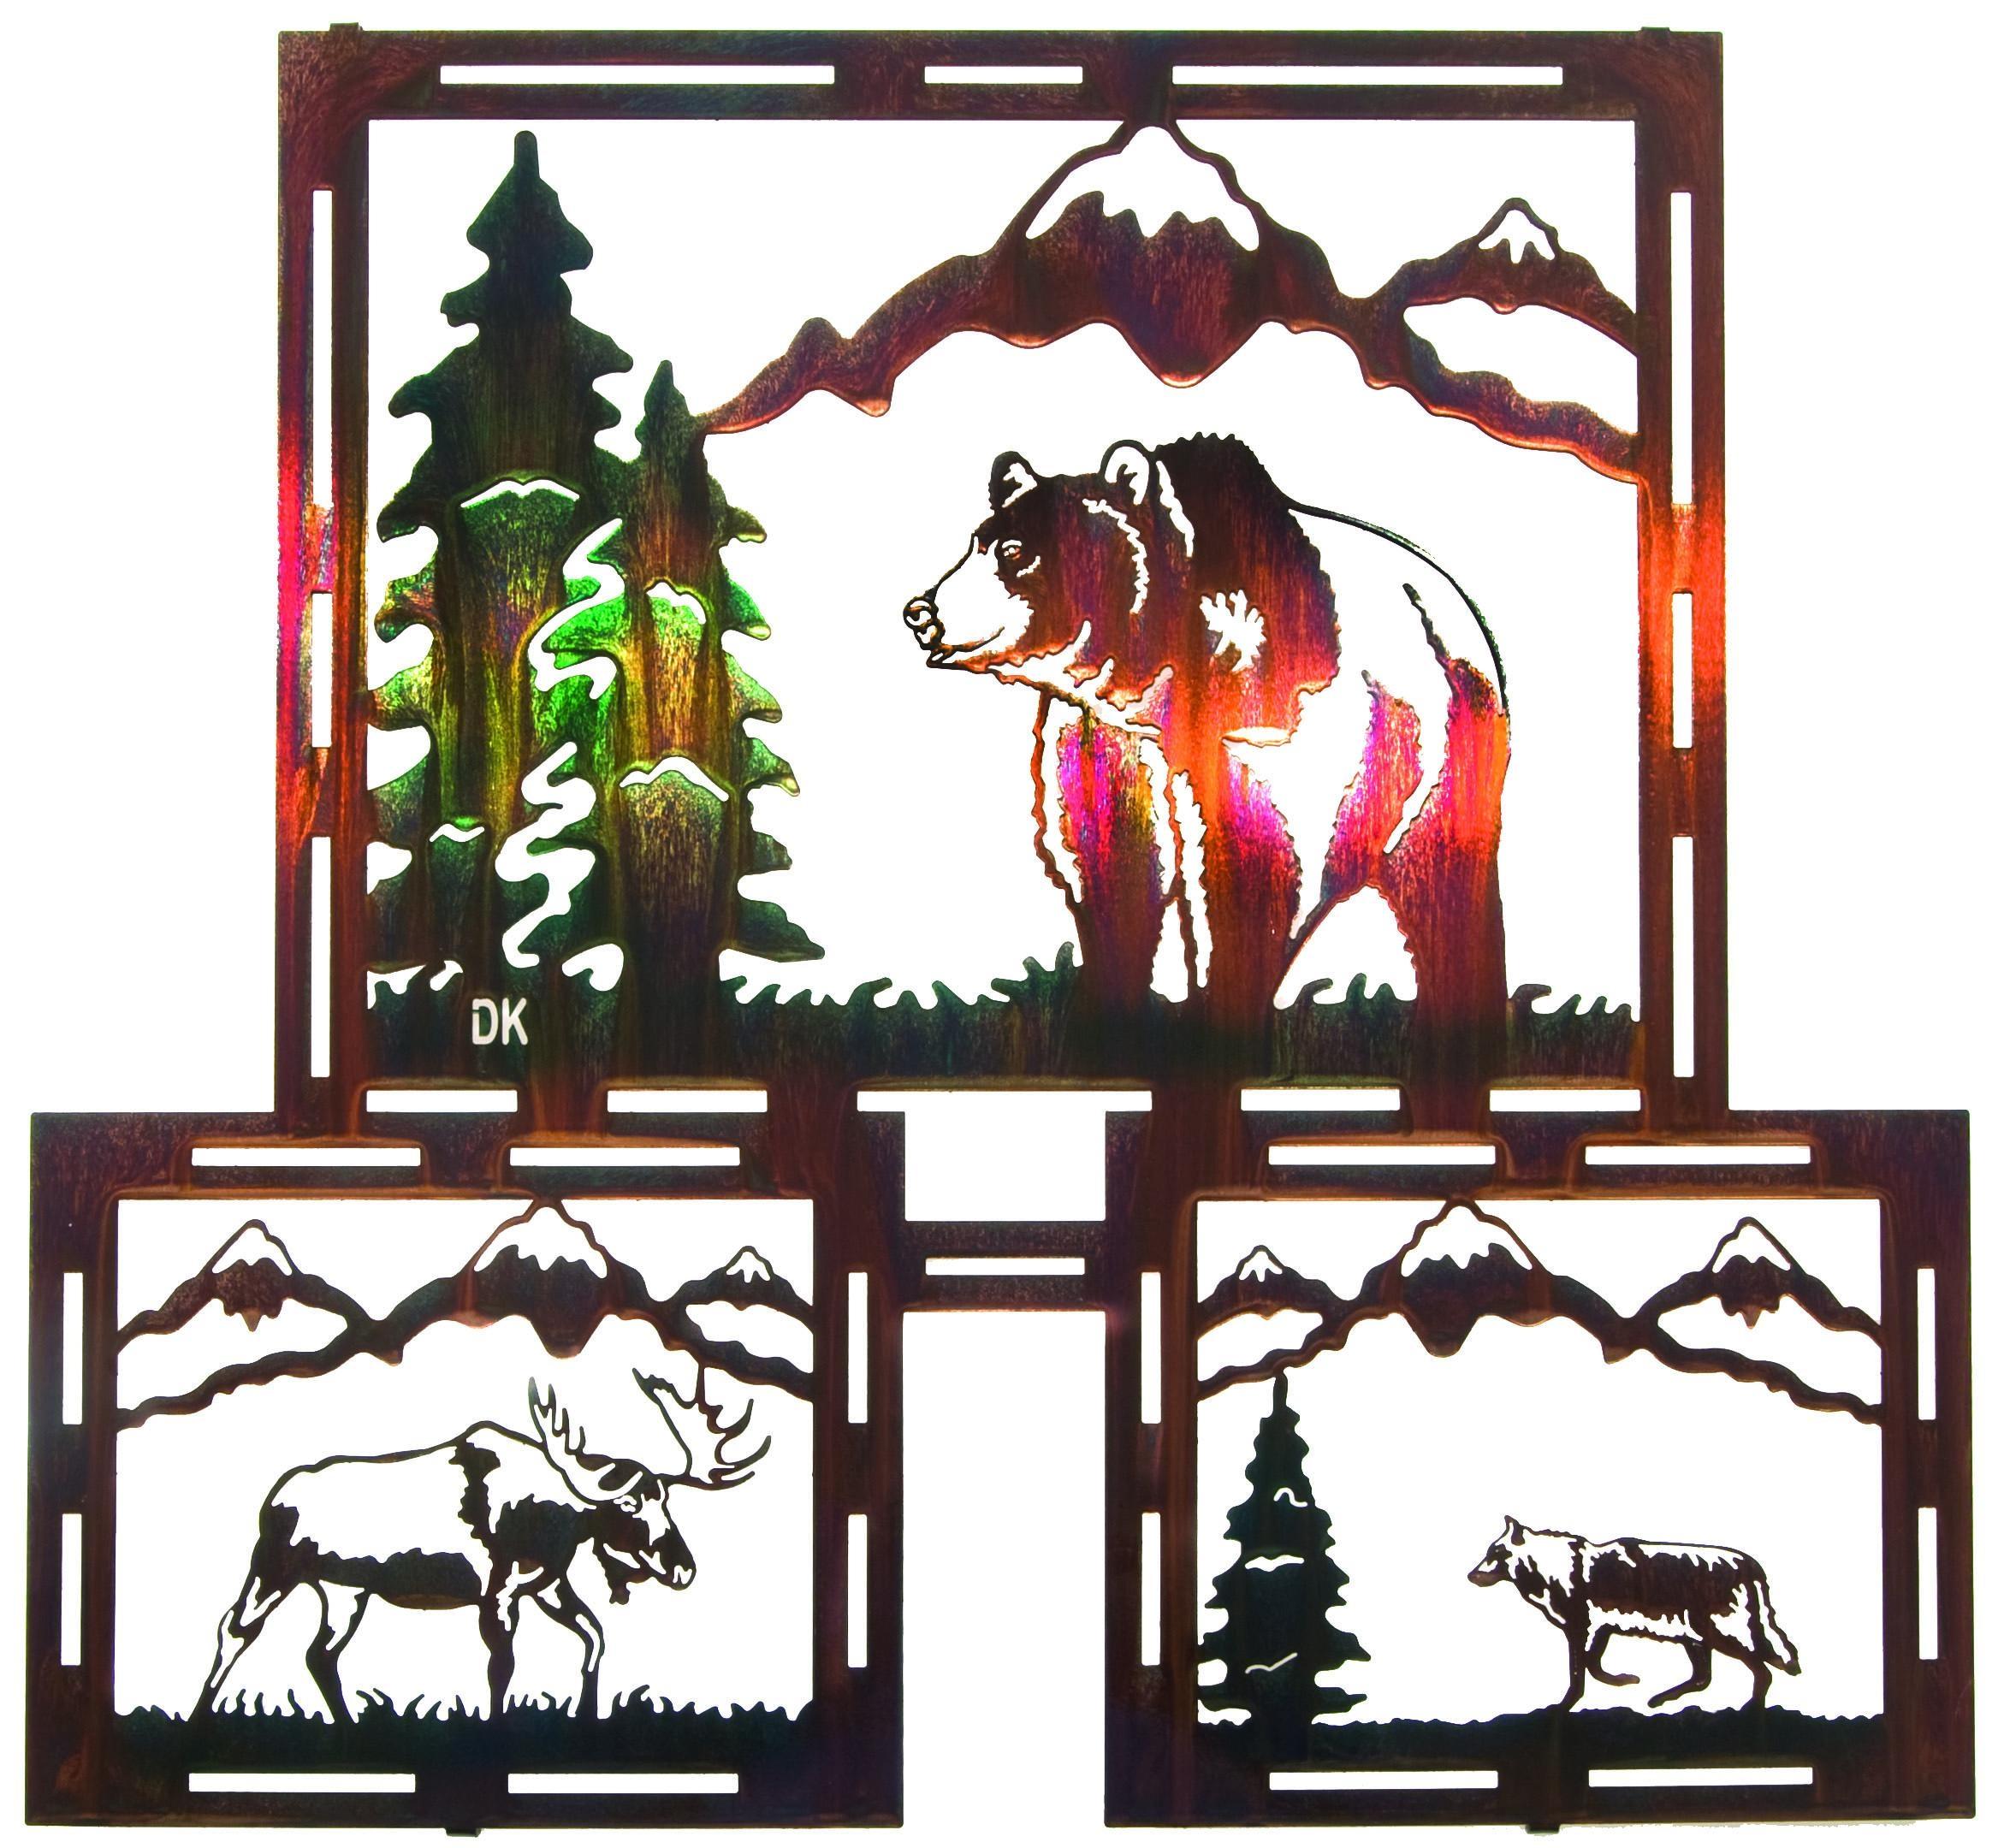 Grizzily – Wolf – Mooselazart – Sanger Metal Art And Gifts Throughout Lazart Metal Art (View 19 of 20)